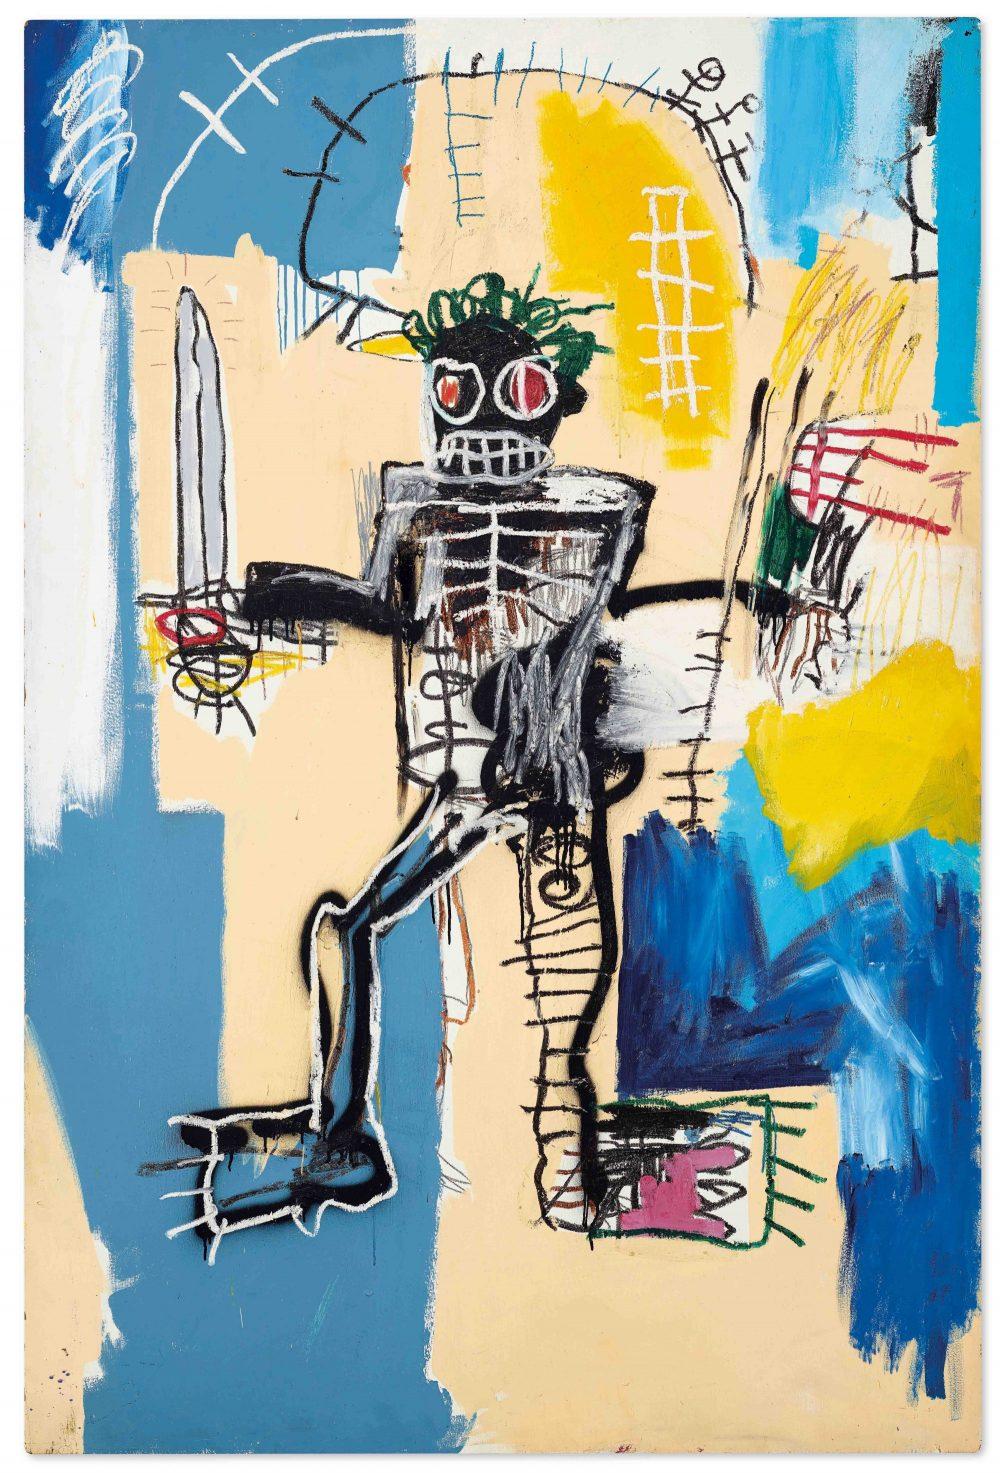 Oriente mira a occidente: Basquiat en Hong Kong